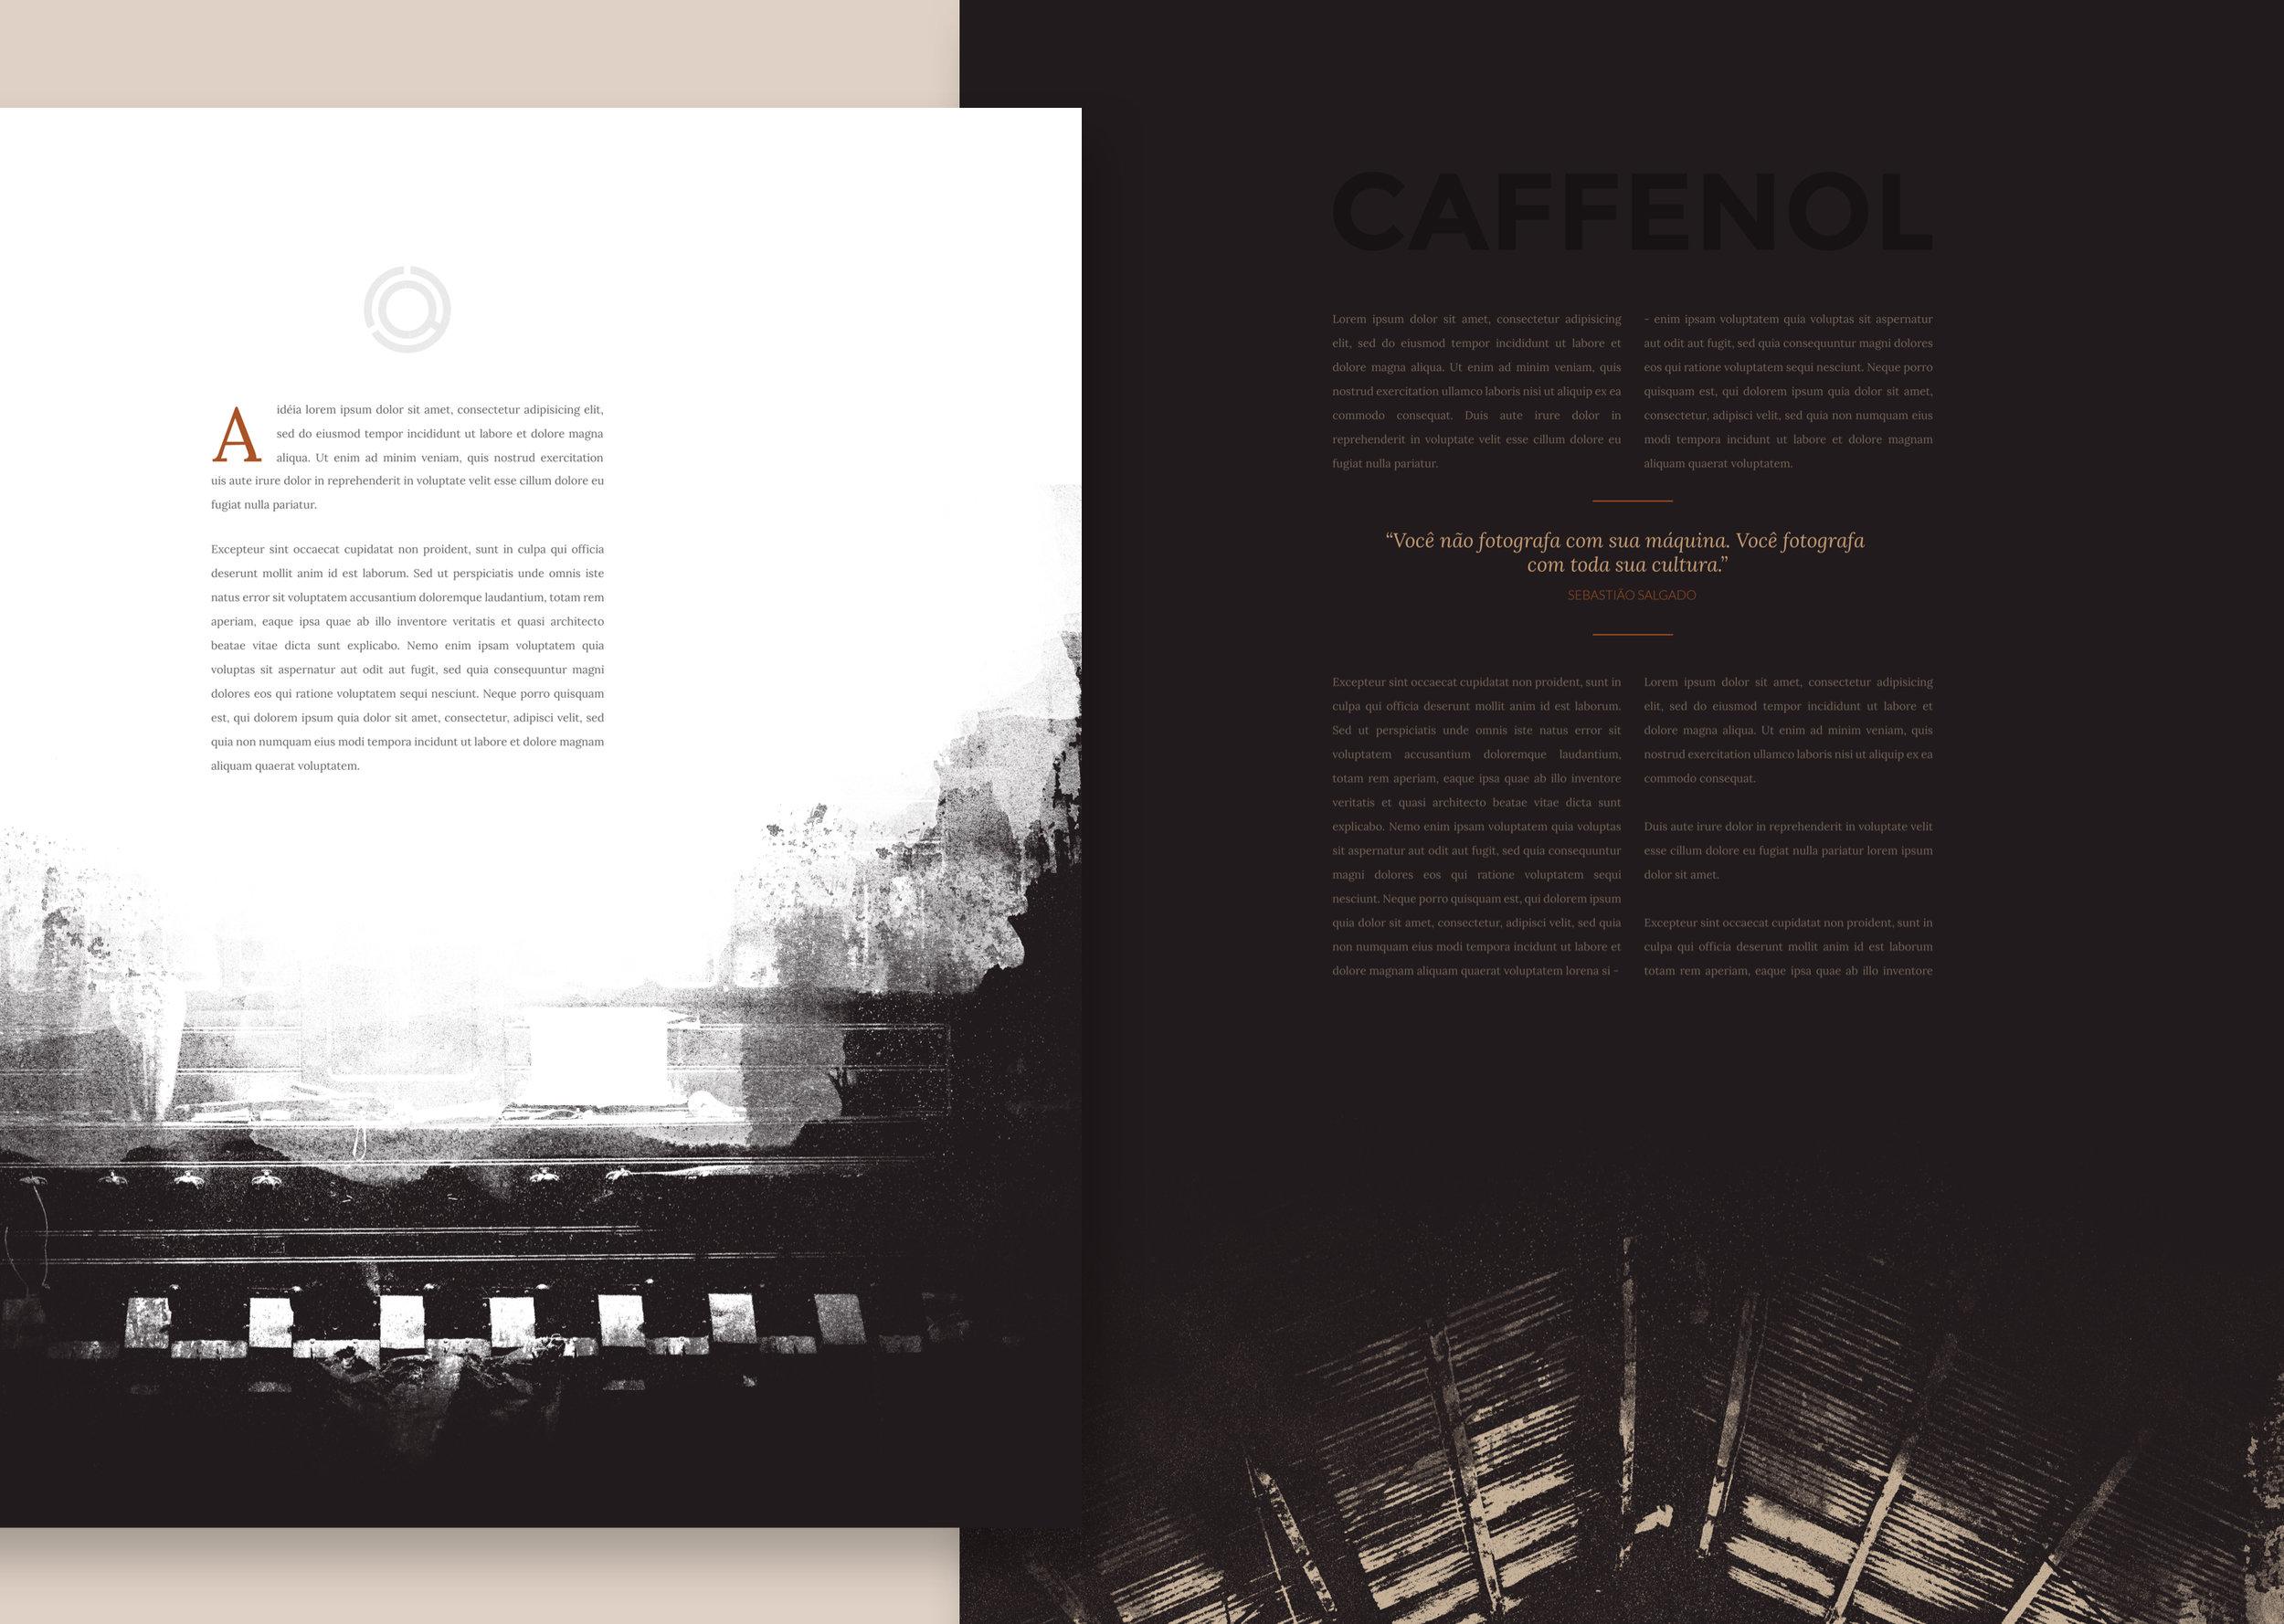 Caffenol website